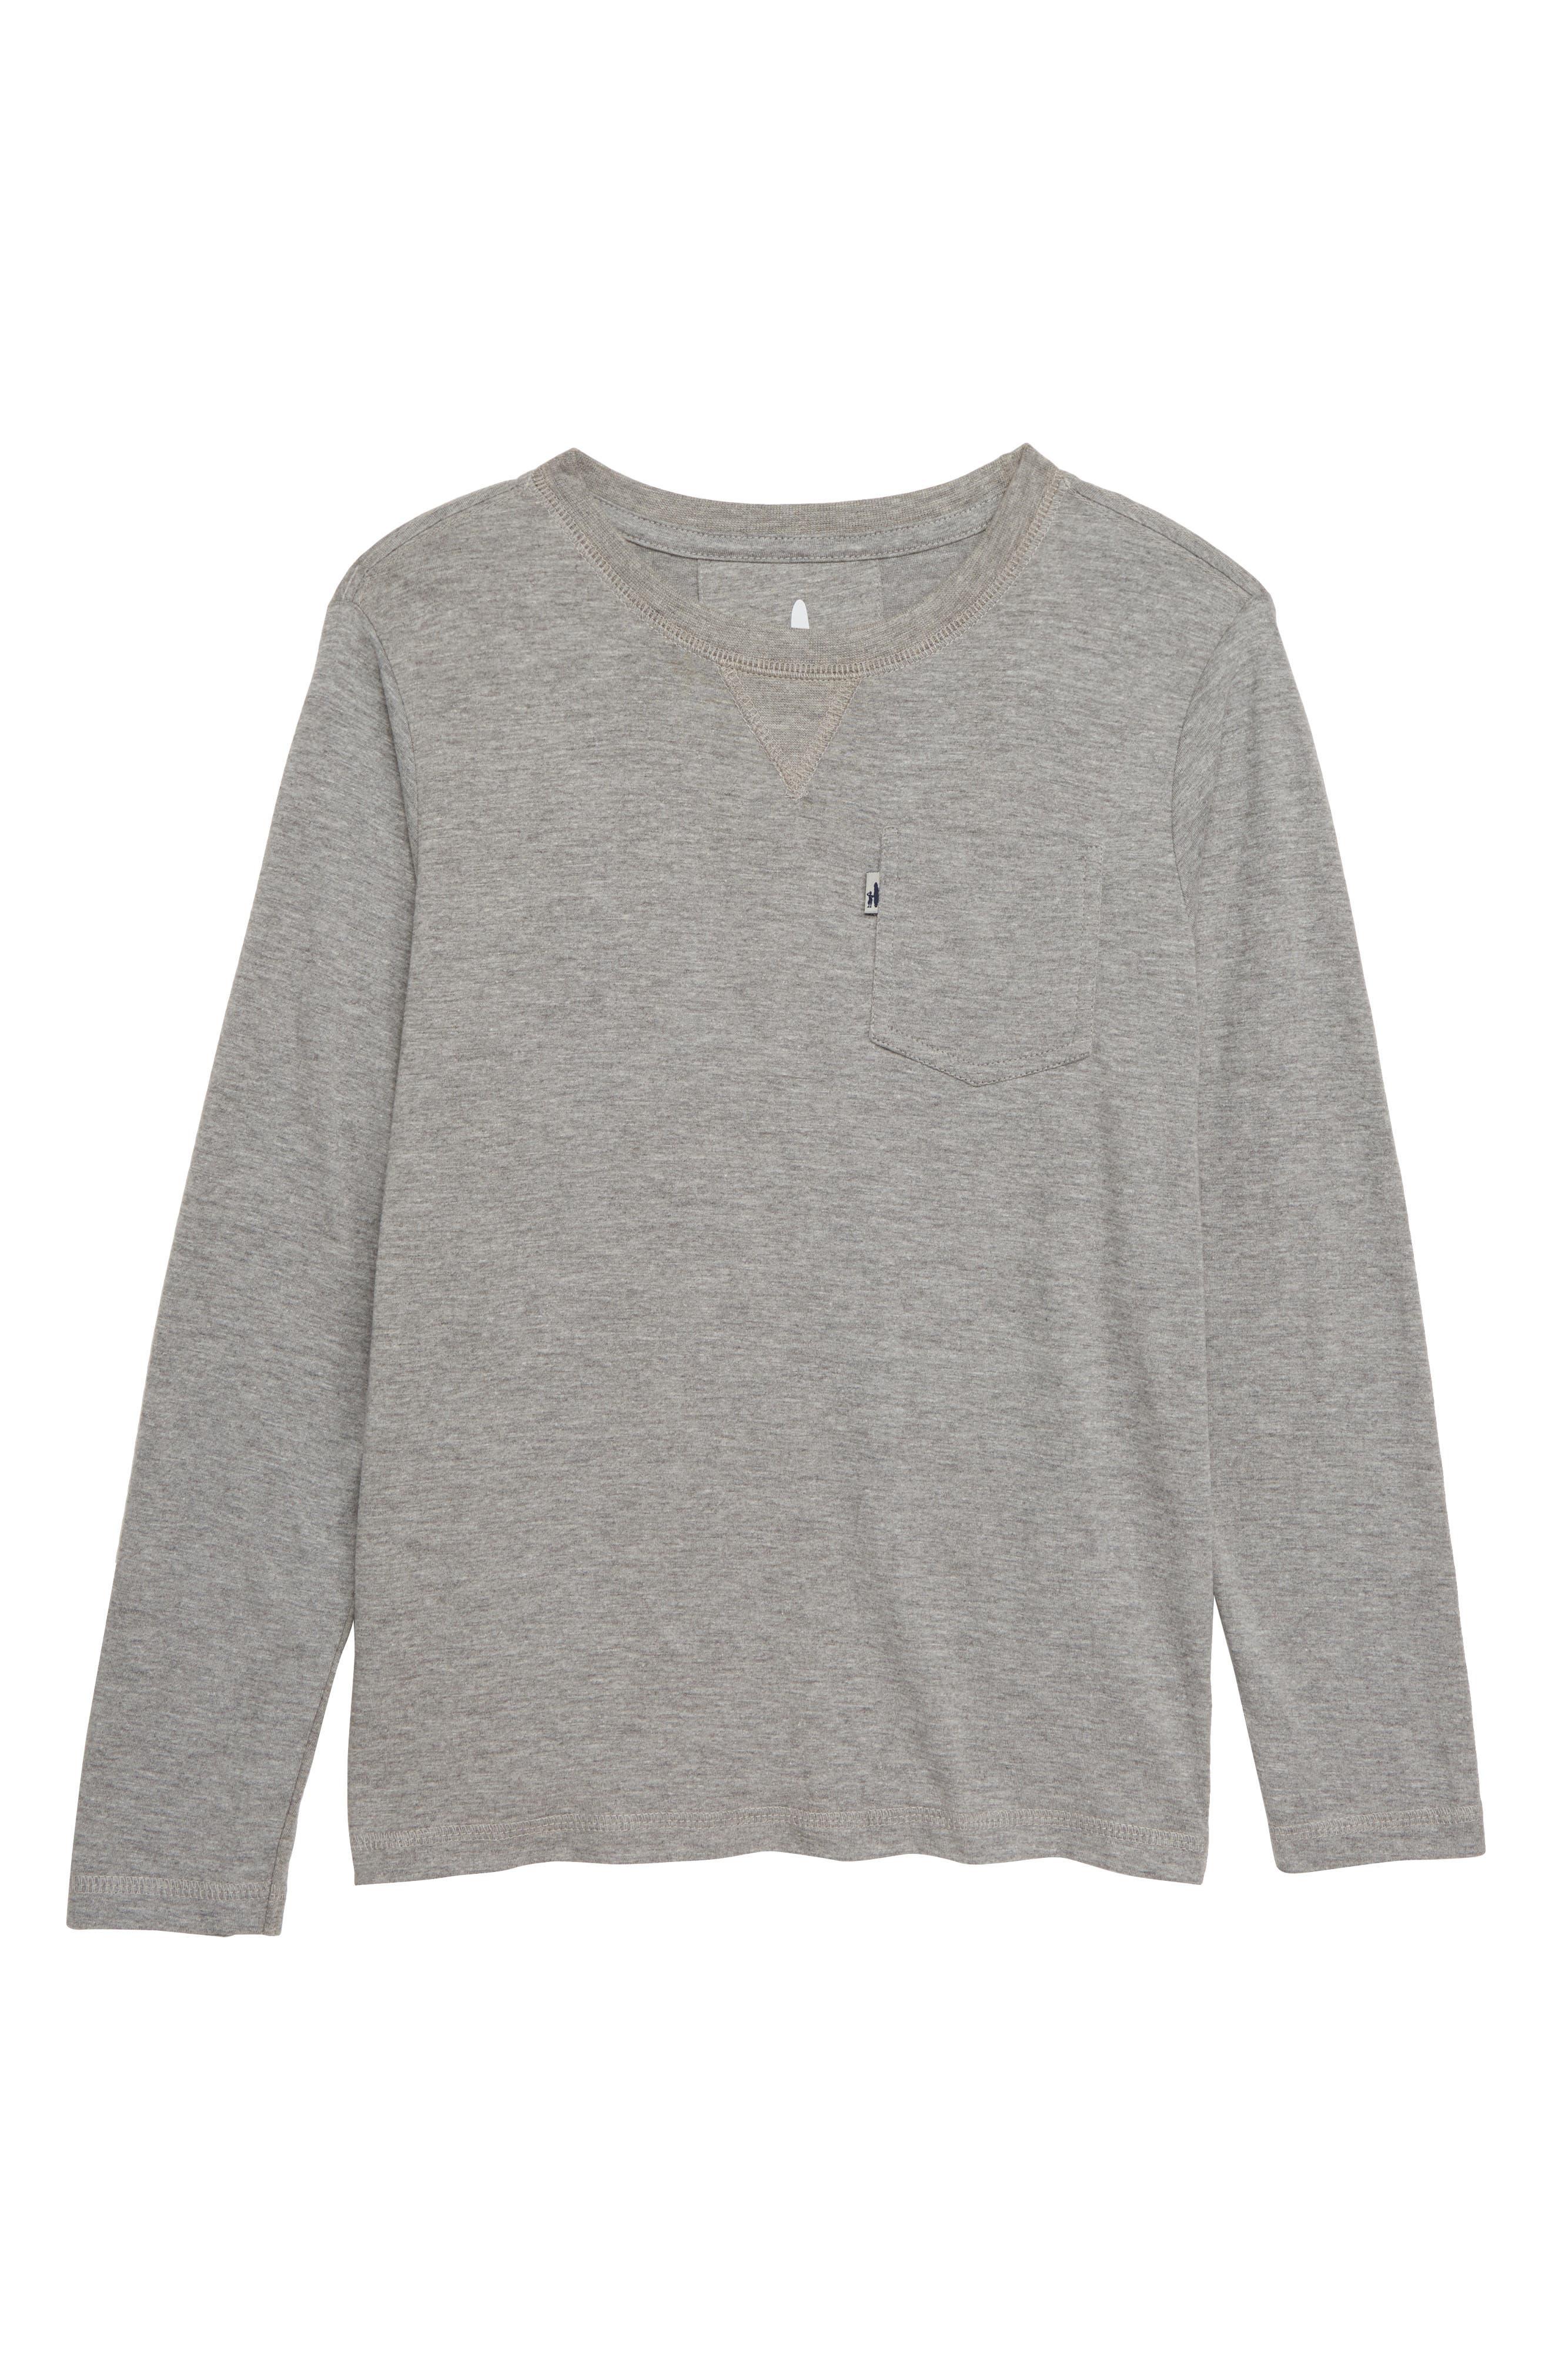 Boys JohnnieO Matty LongSleeve Pocket TShirt Size 8  White